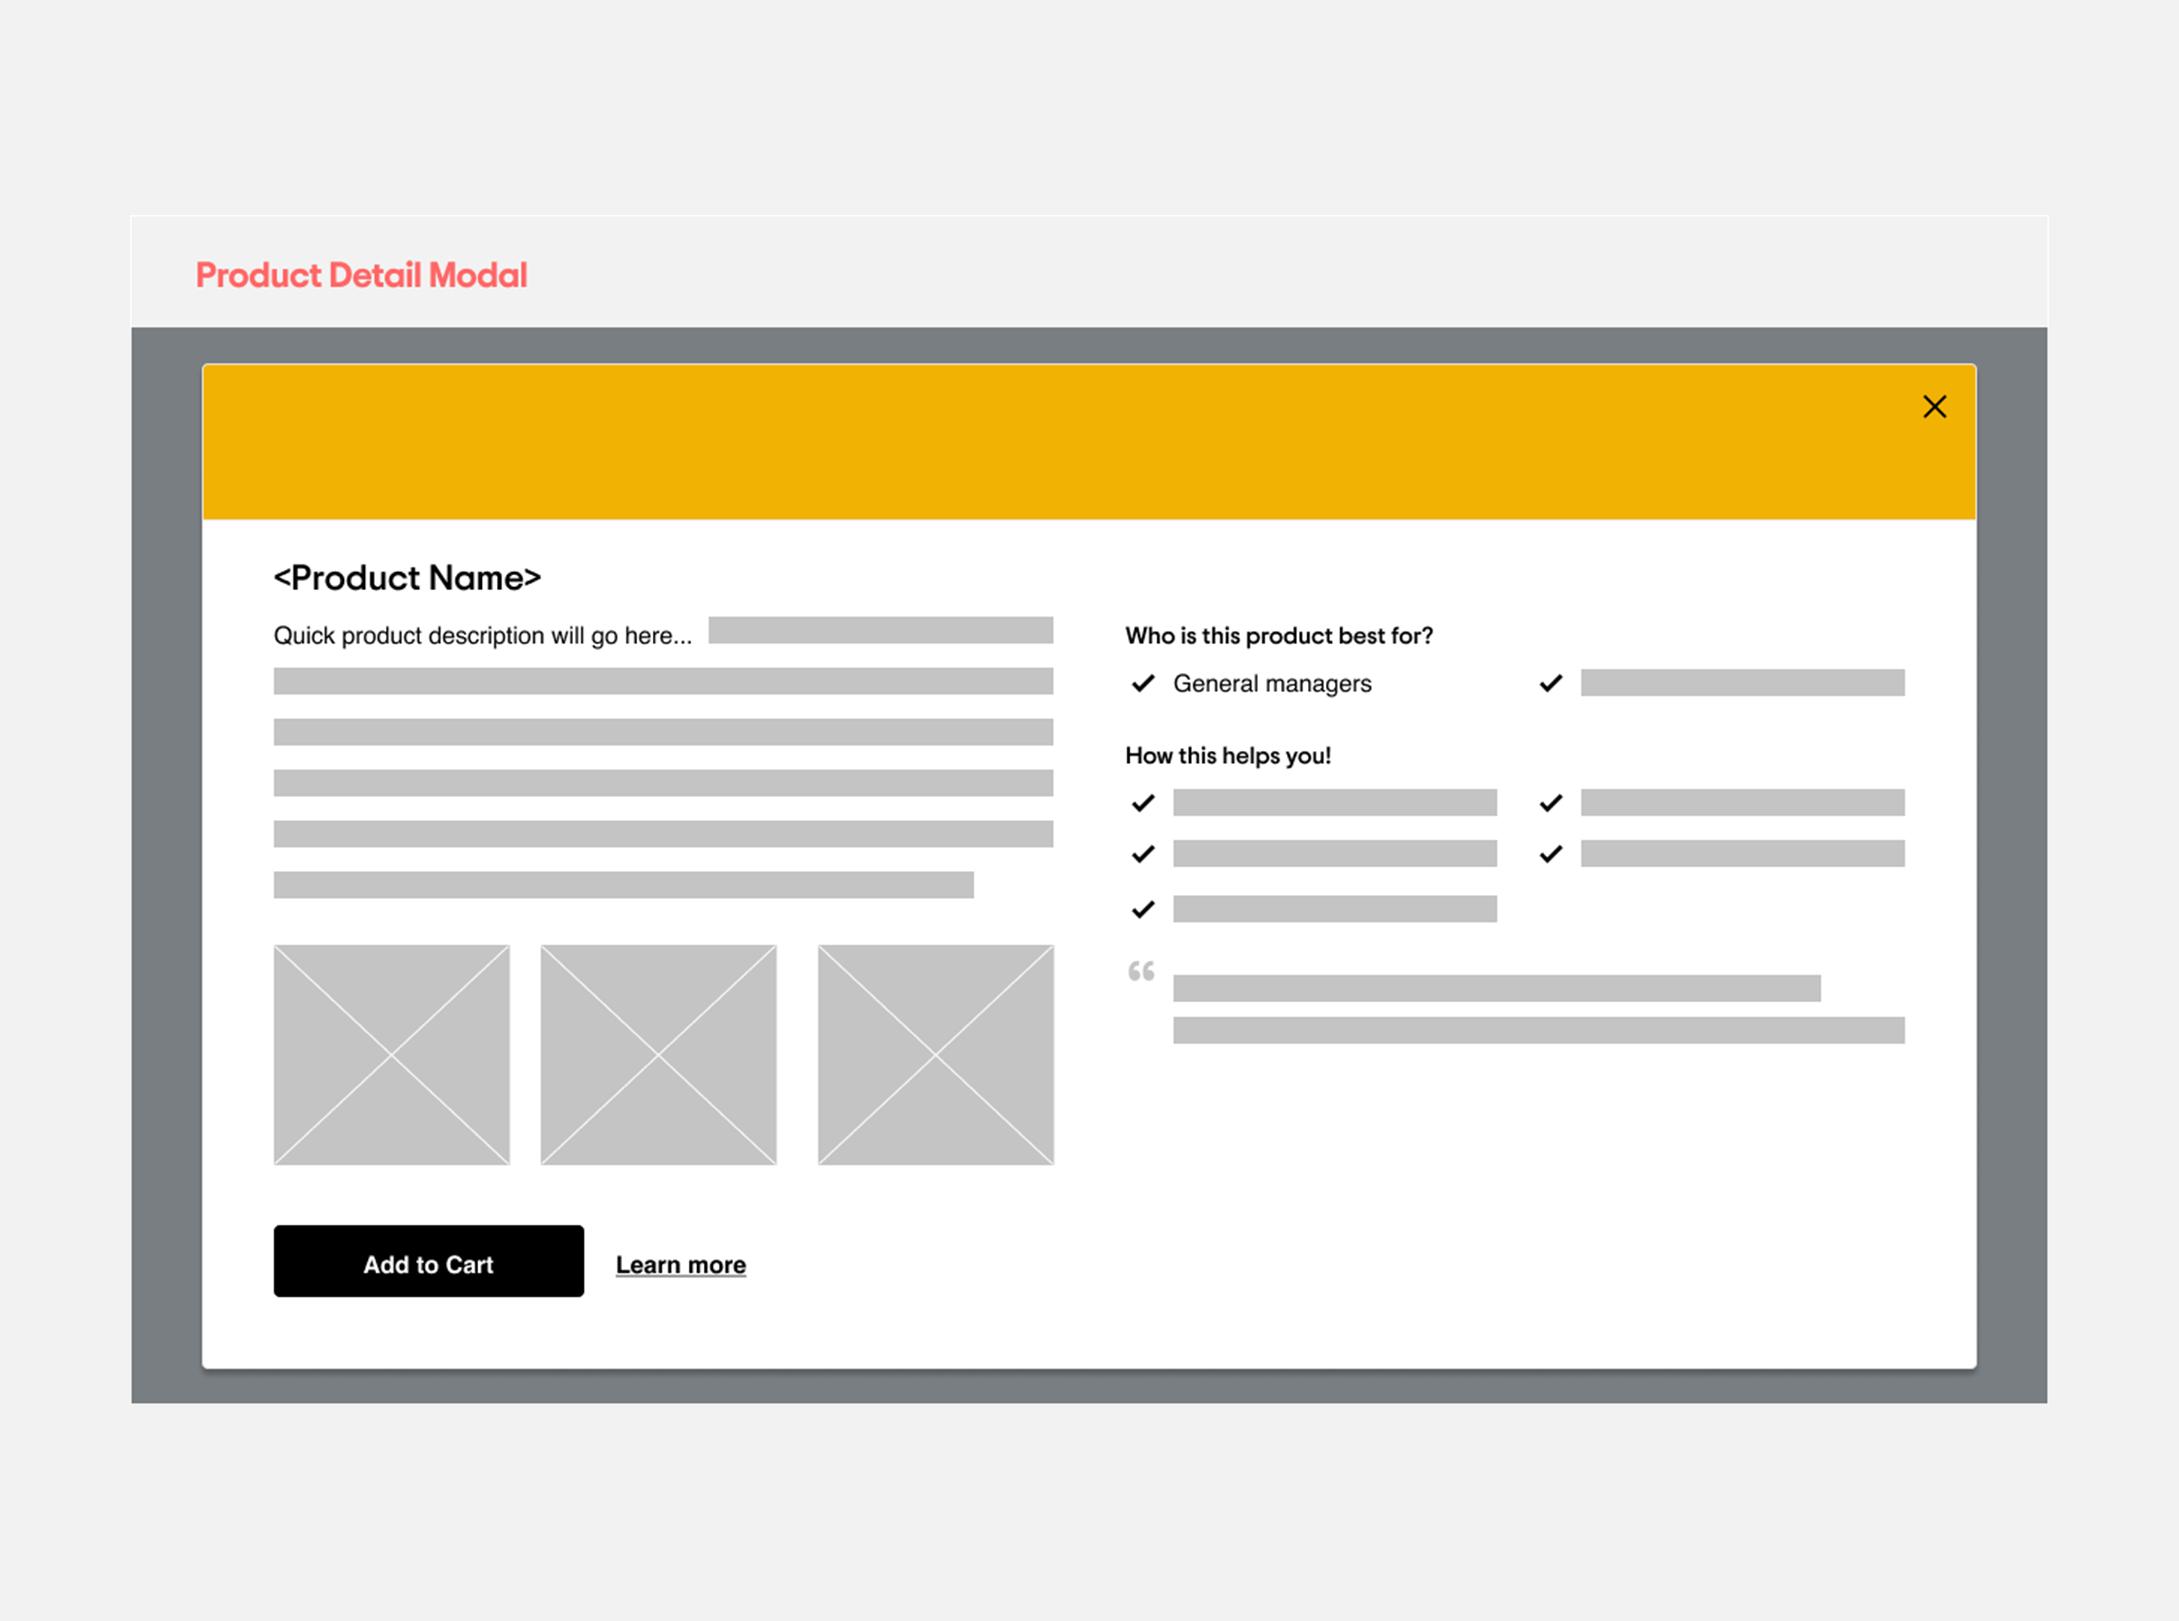 Product Detail Modal – Testimonials